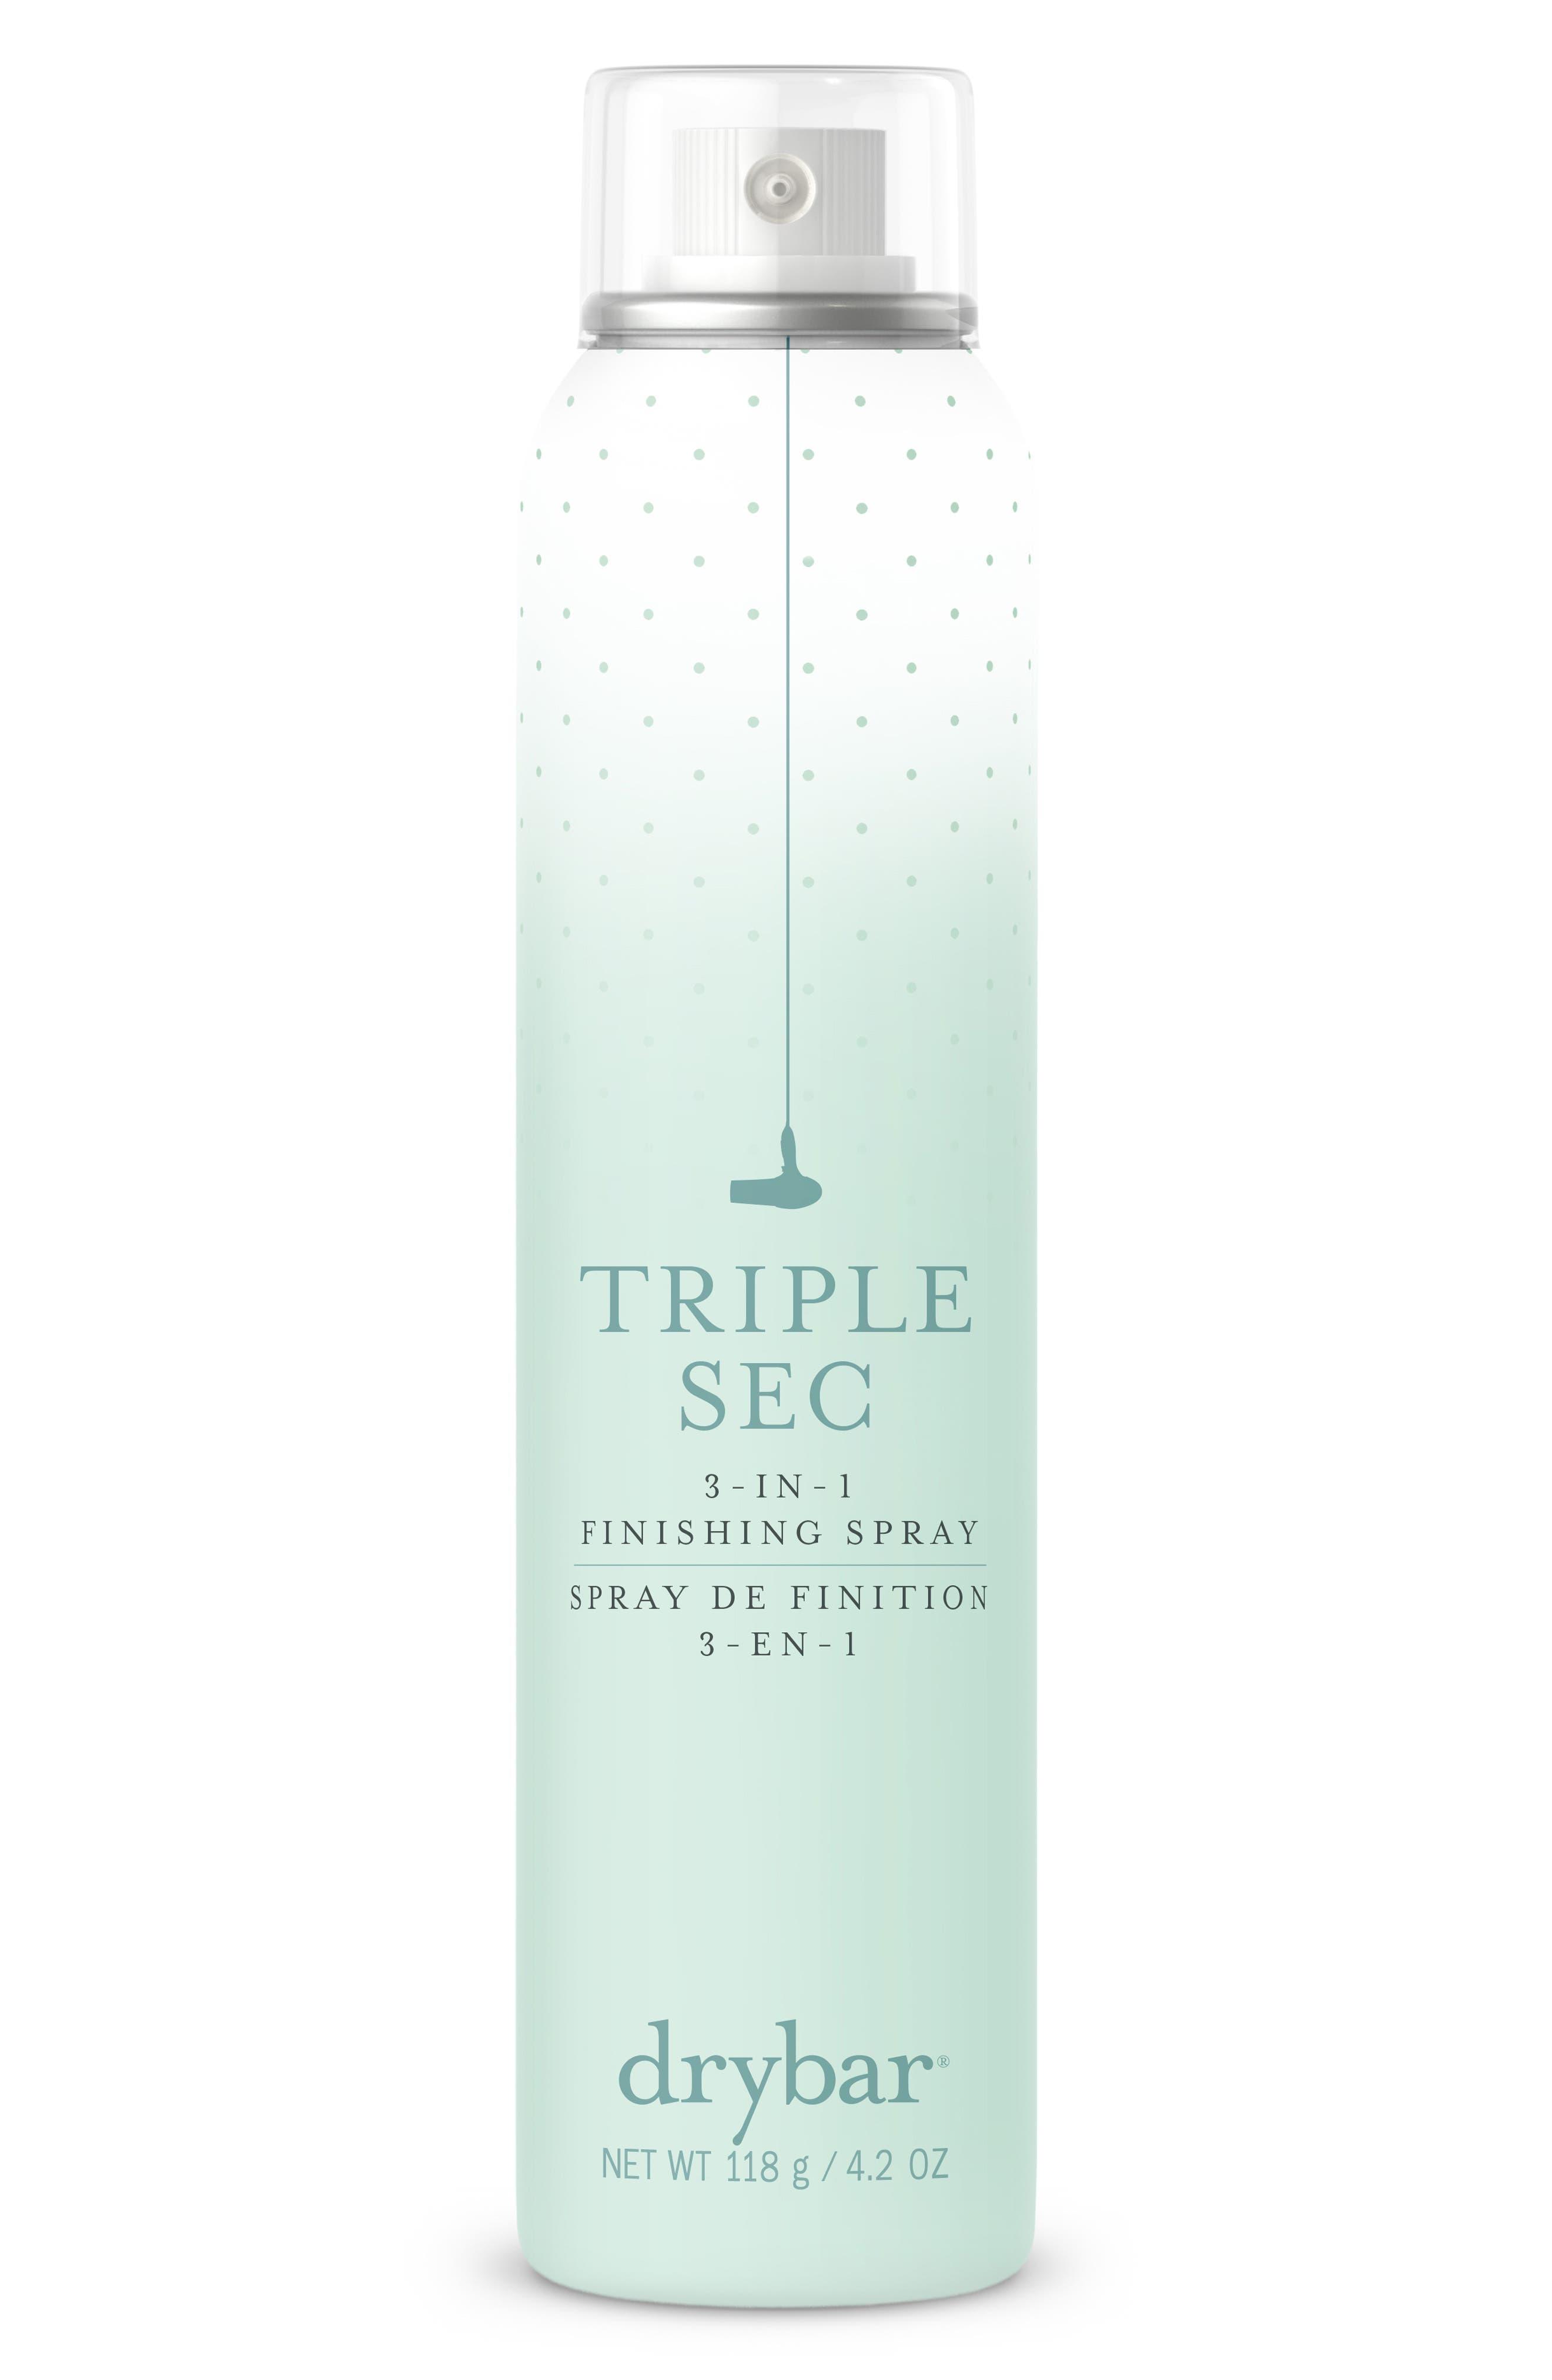 Triple Sec 3-In-1 Finishing Spray